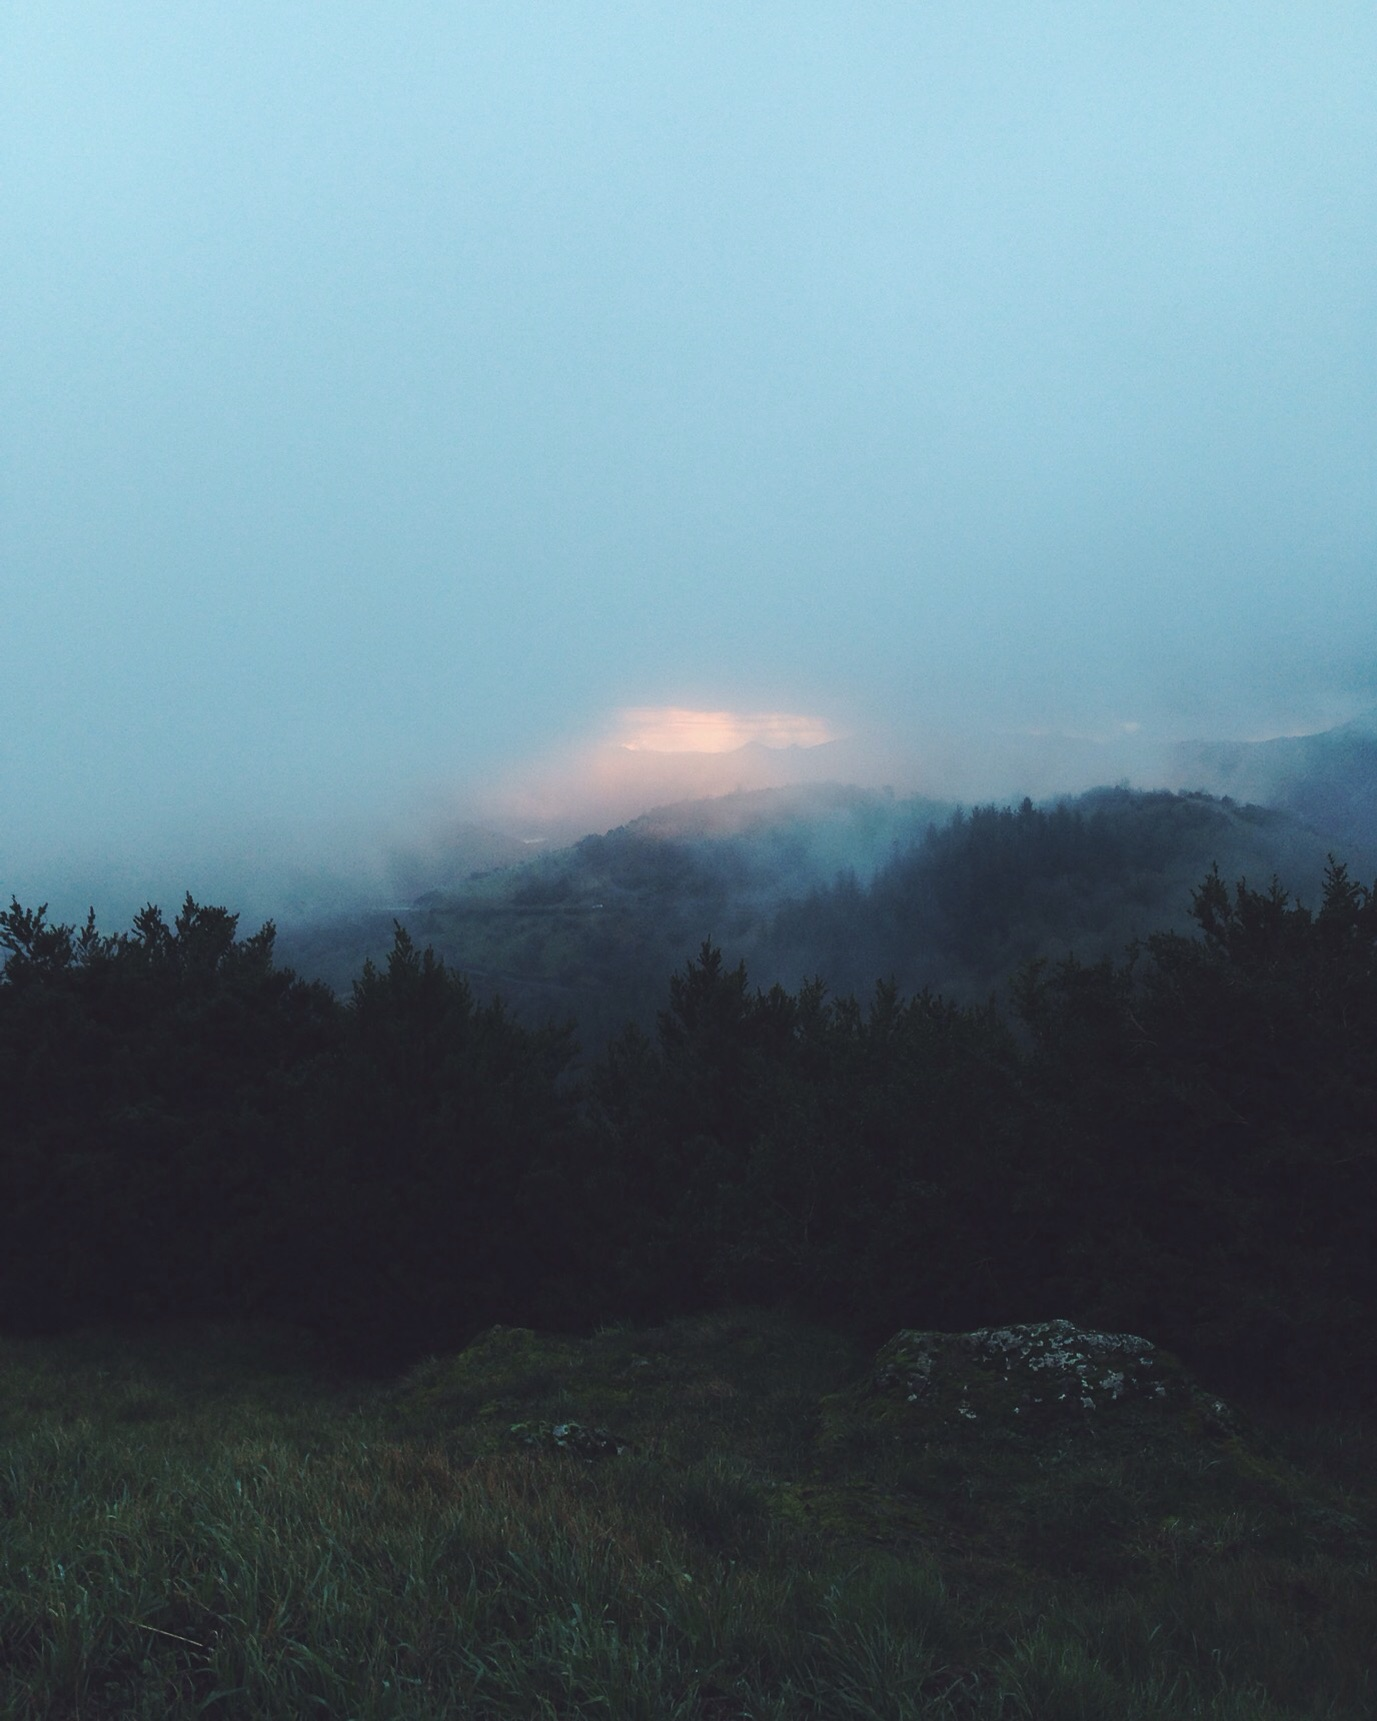 sunrise in foggy mountains